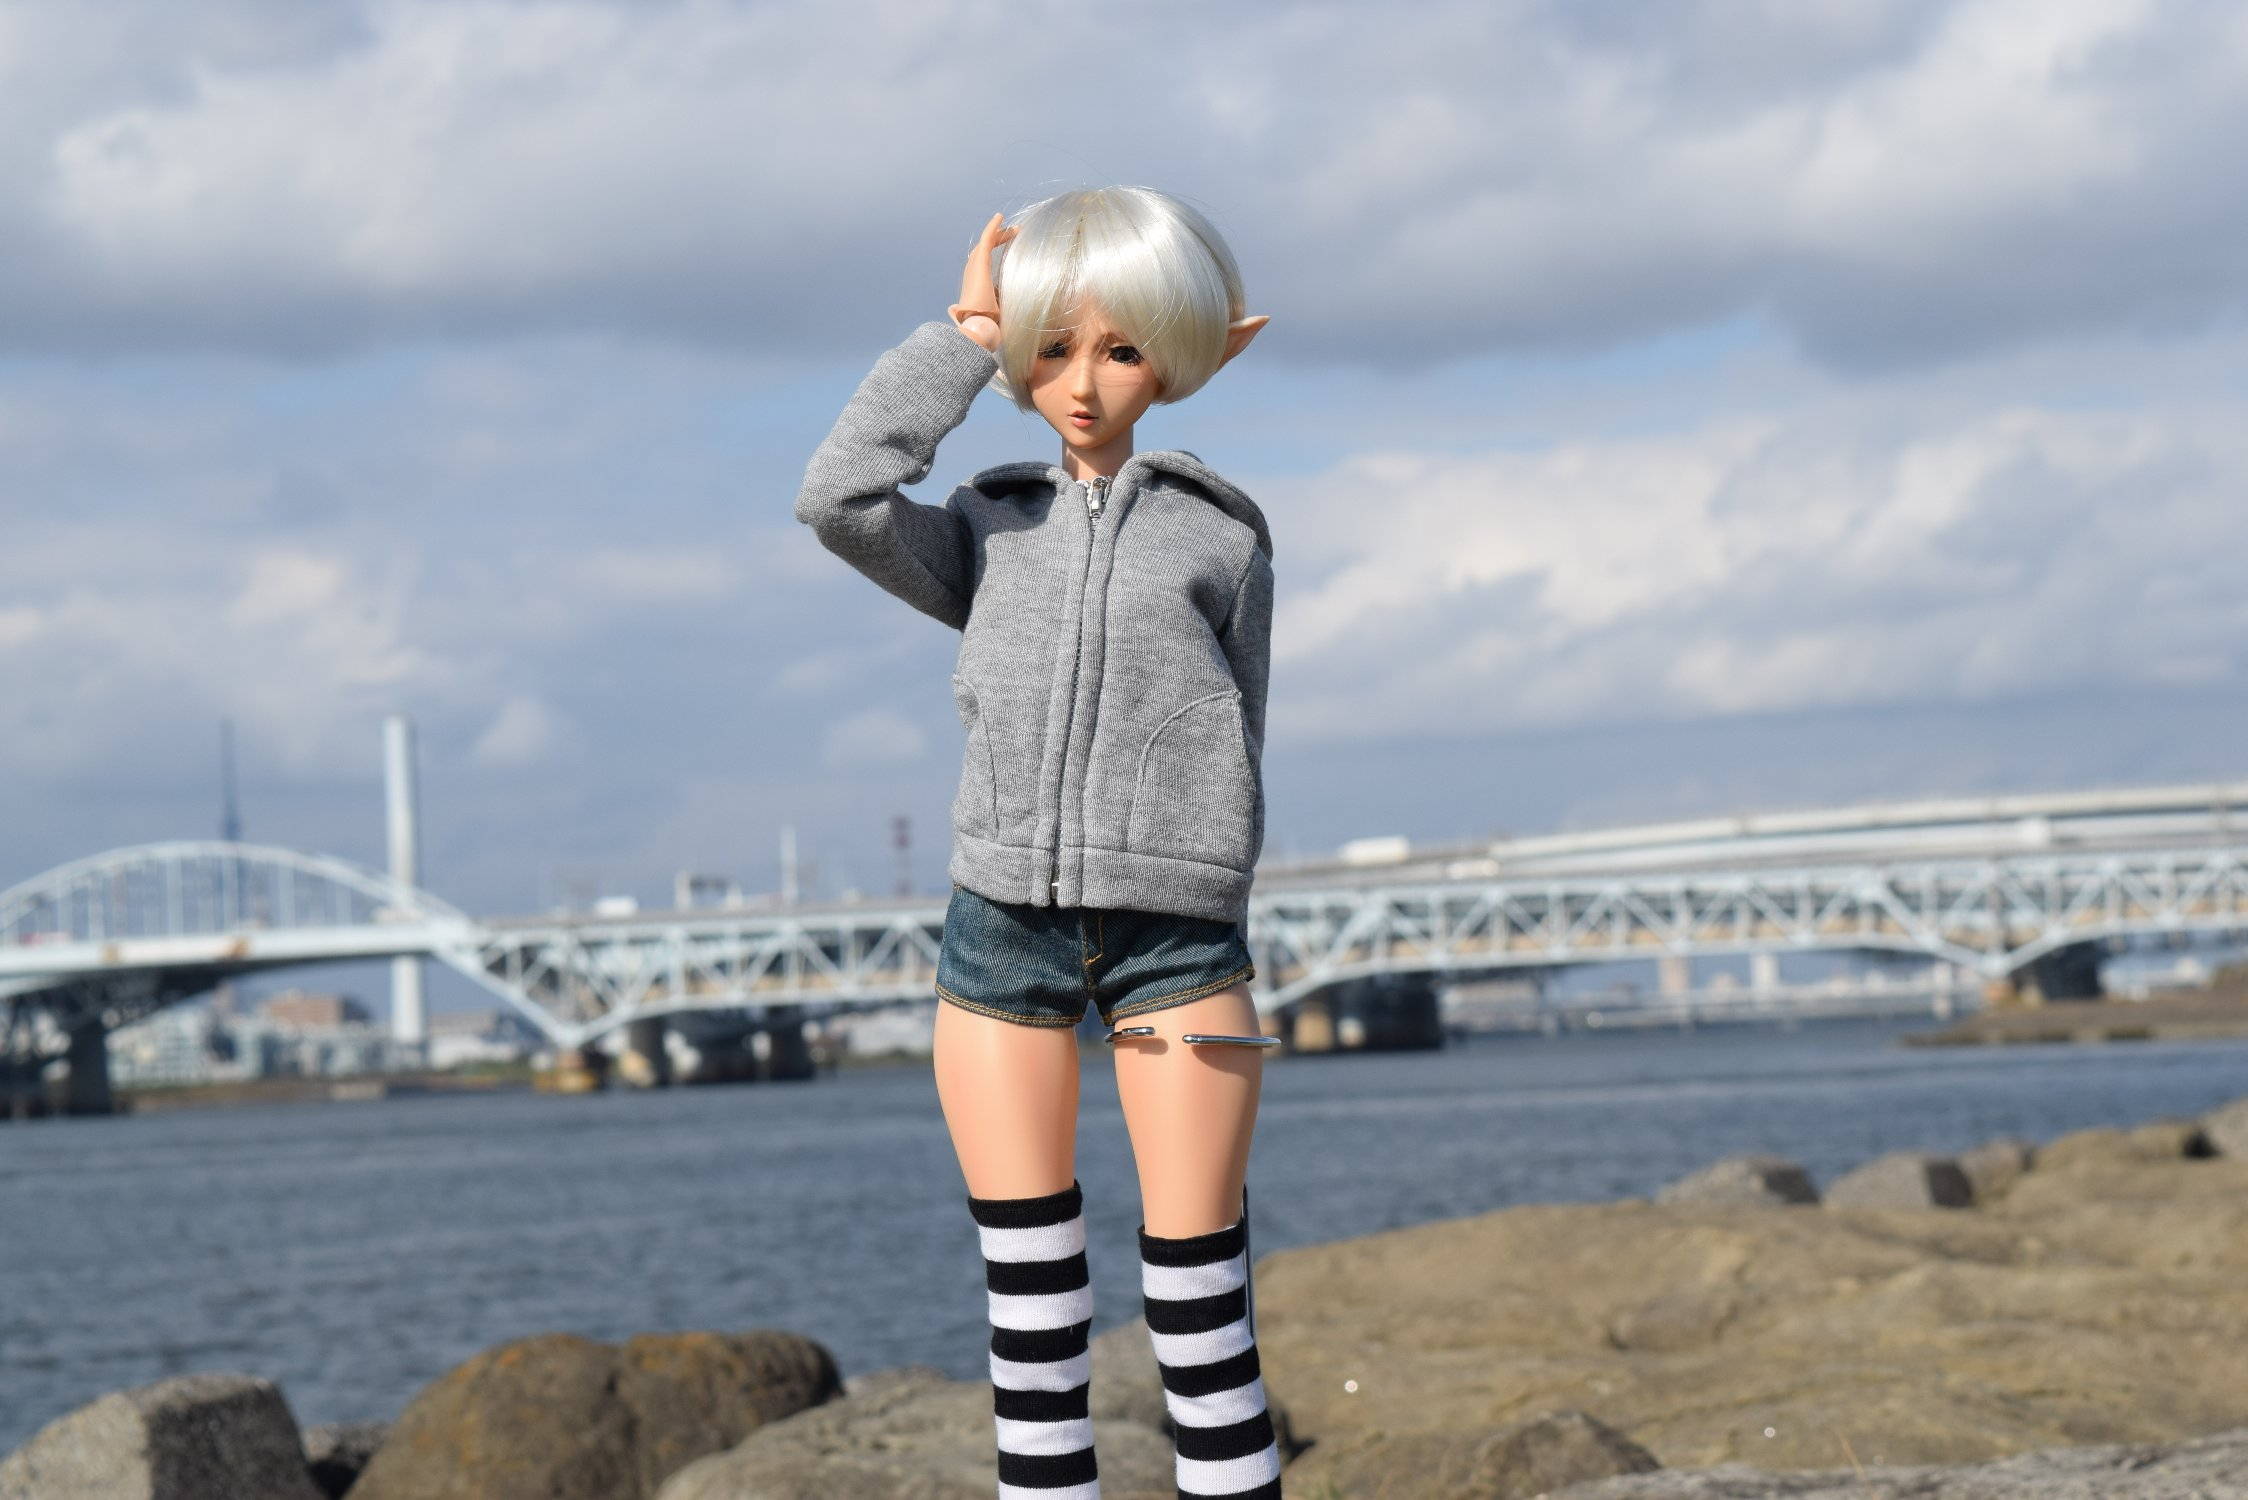 doll_2535.jpg